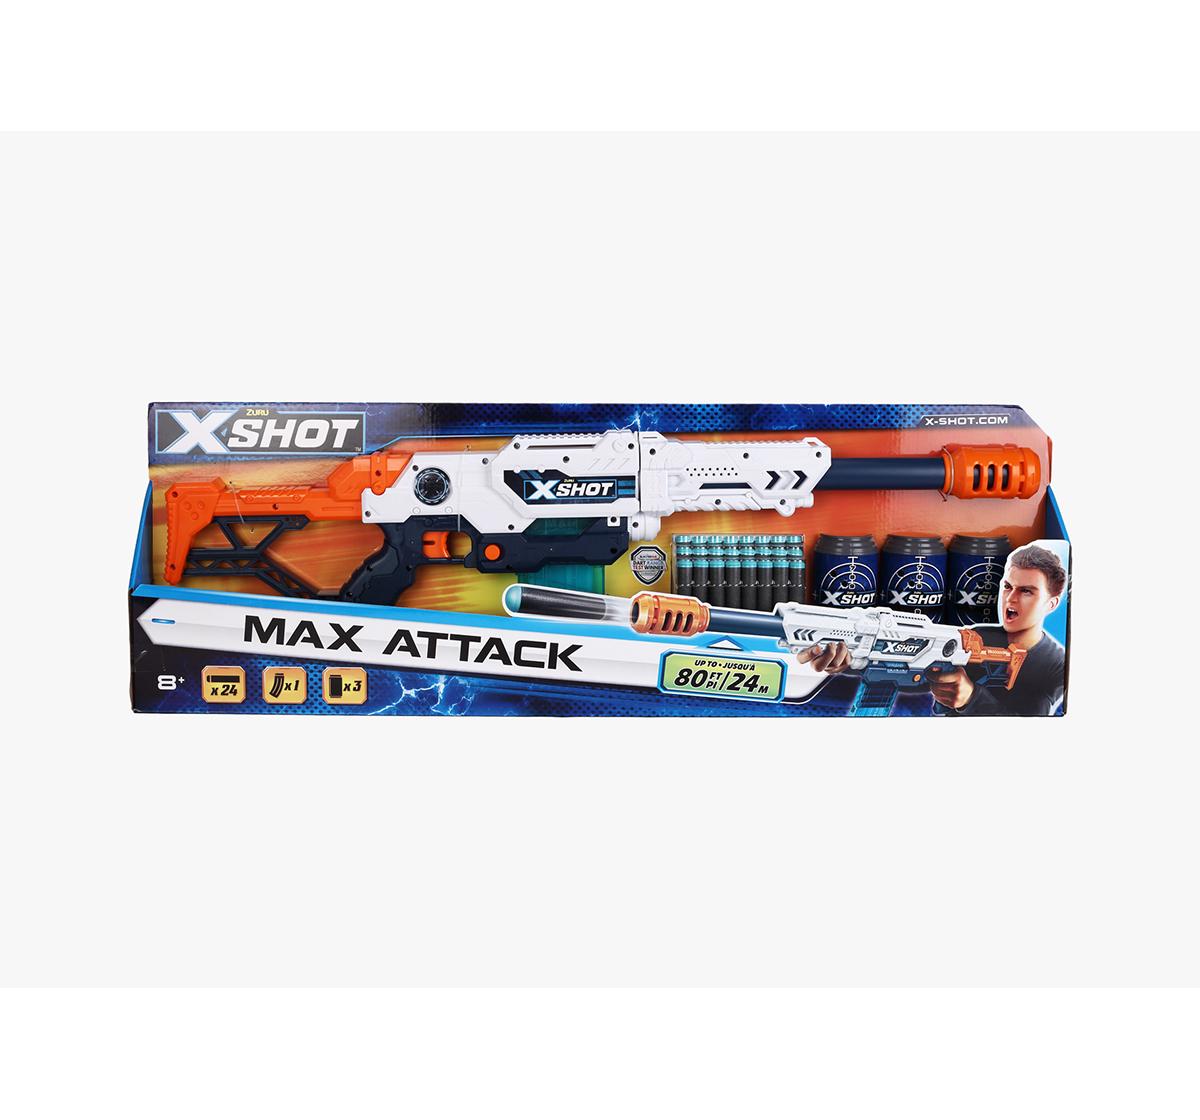 X-Shot | X-Shot Ne Zuru Clip Blaster L Max Attack Blasters for Kids age 8Y+